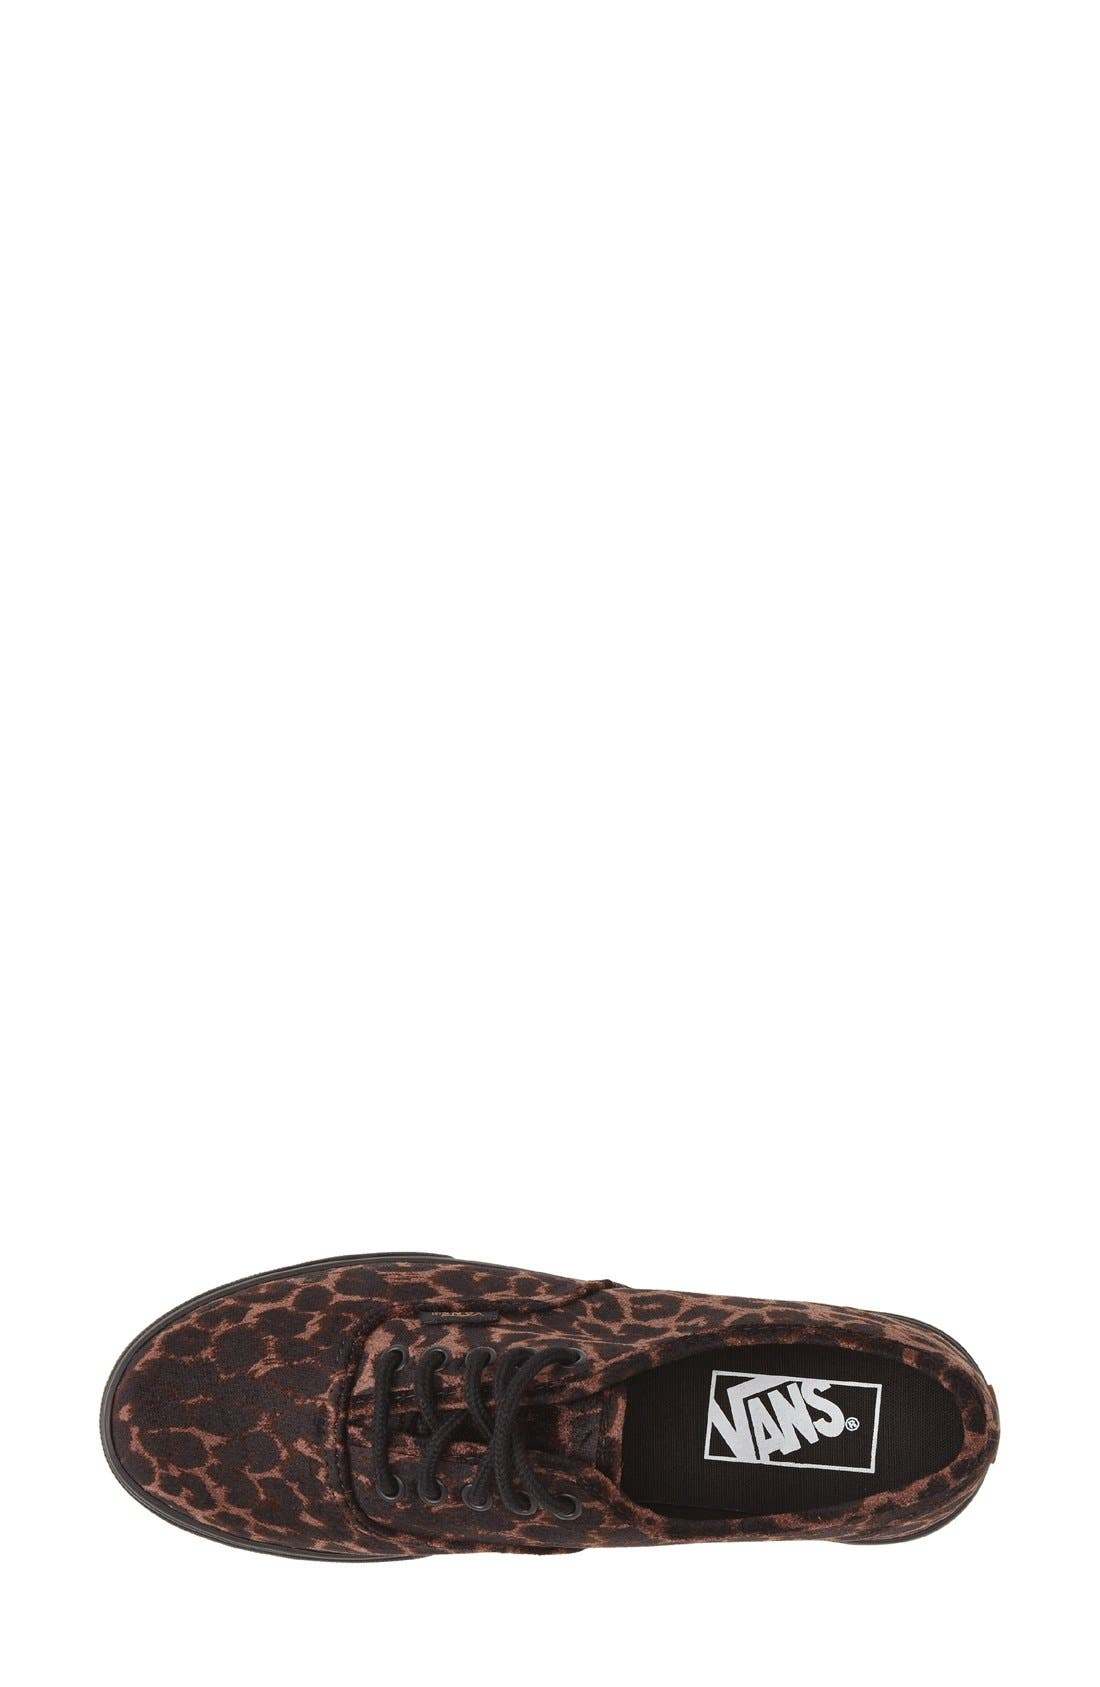 Alternate Image 3  - Vans 'Authentic - Lo Pro' Leopard Print Sneaker (Women)